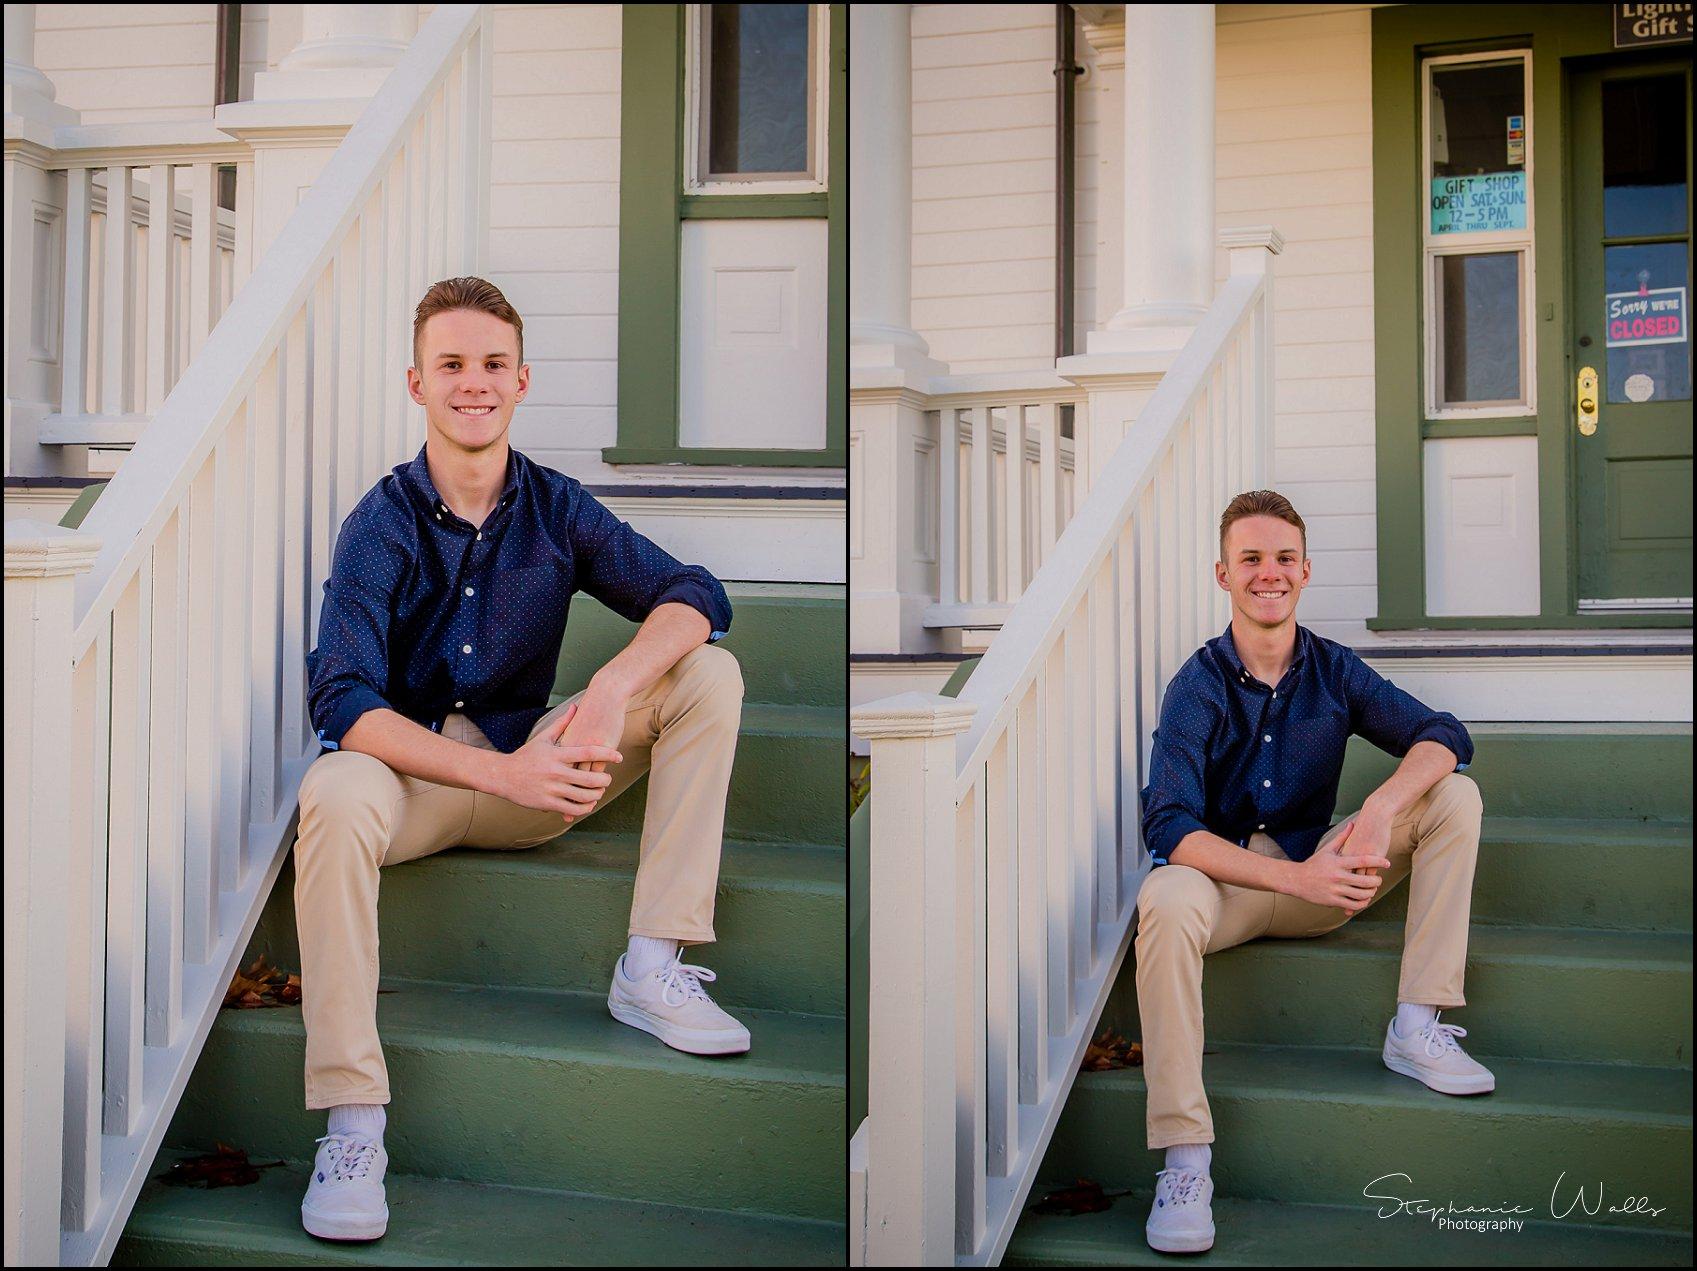 Josh Co2018 002 Josh Co2018 | Mukilteo Lighthouse Park | Bothell High School Senior Photographer